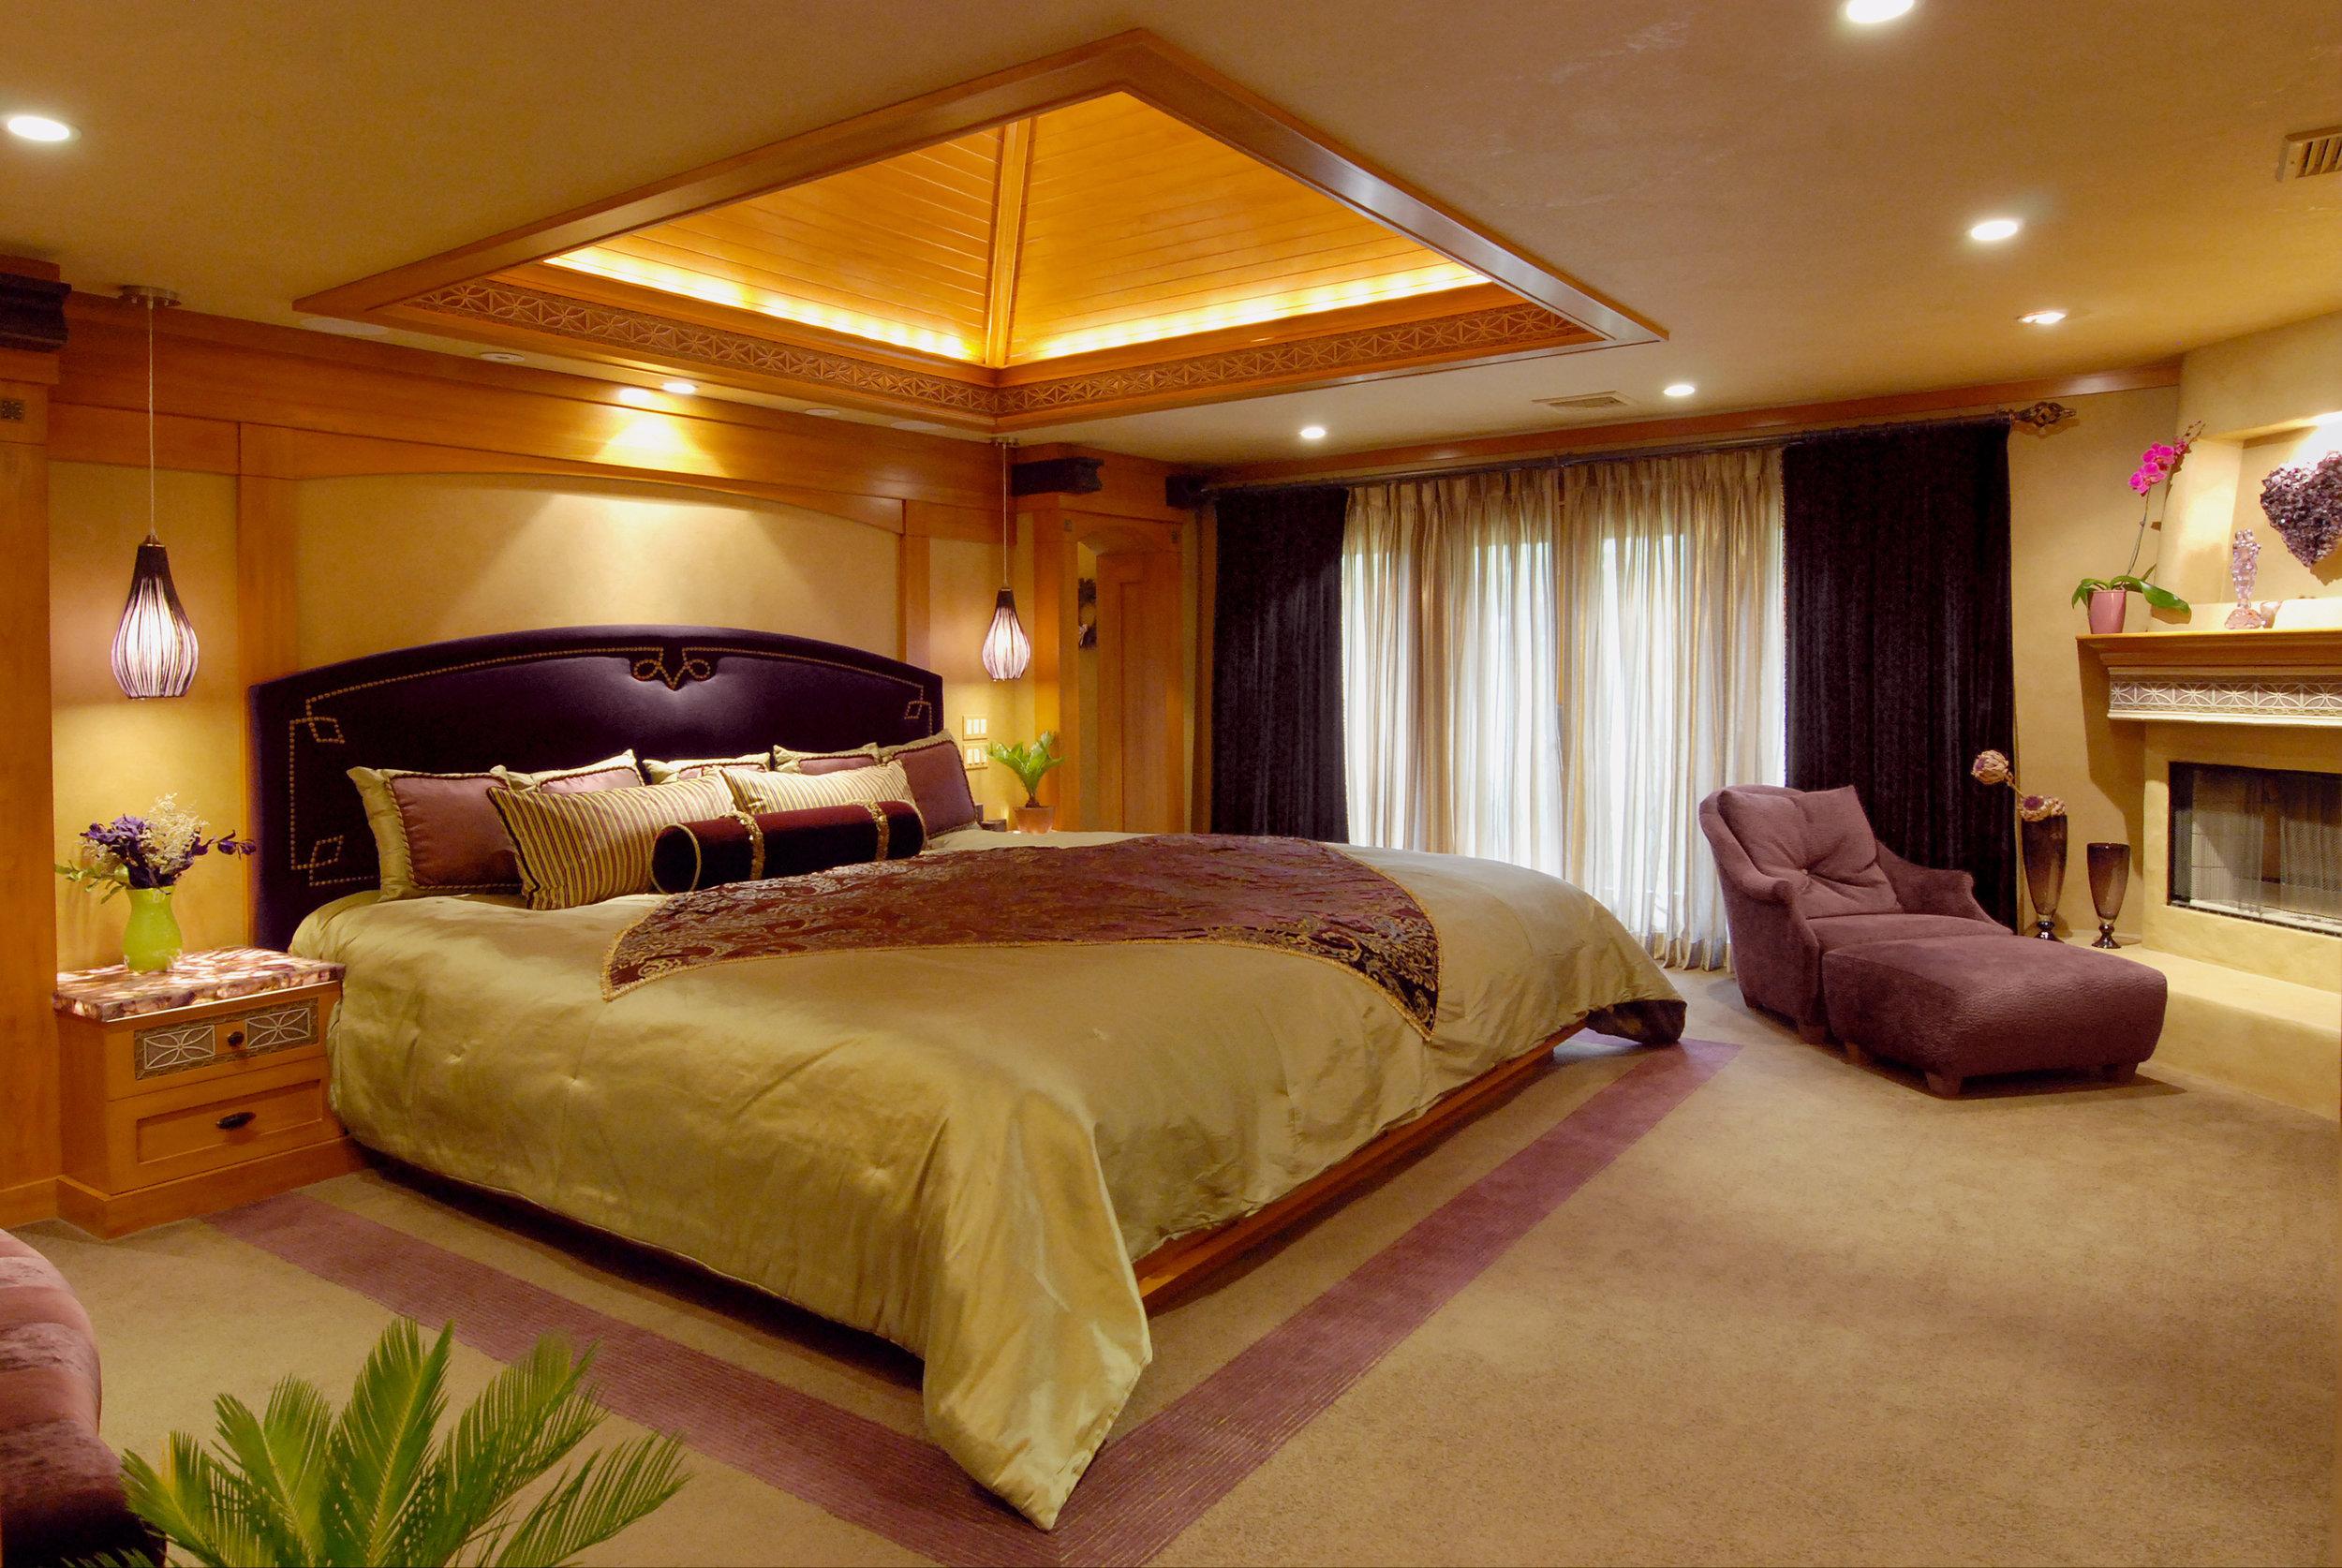 Bedroom1a.jpeg